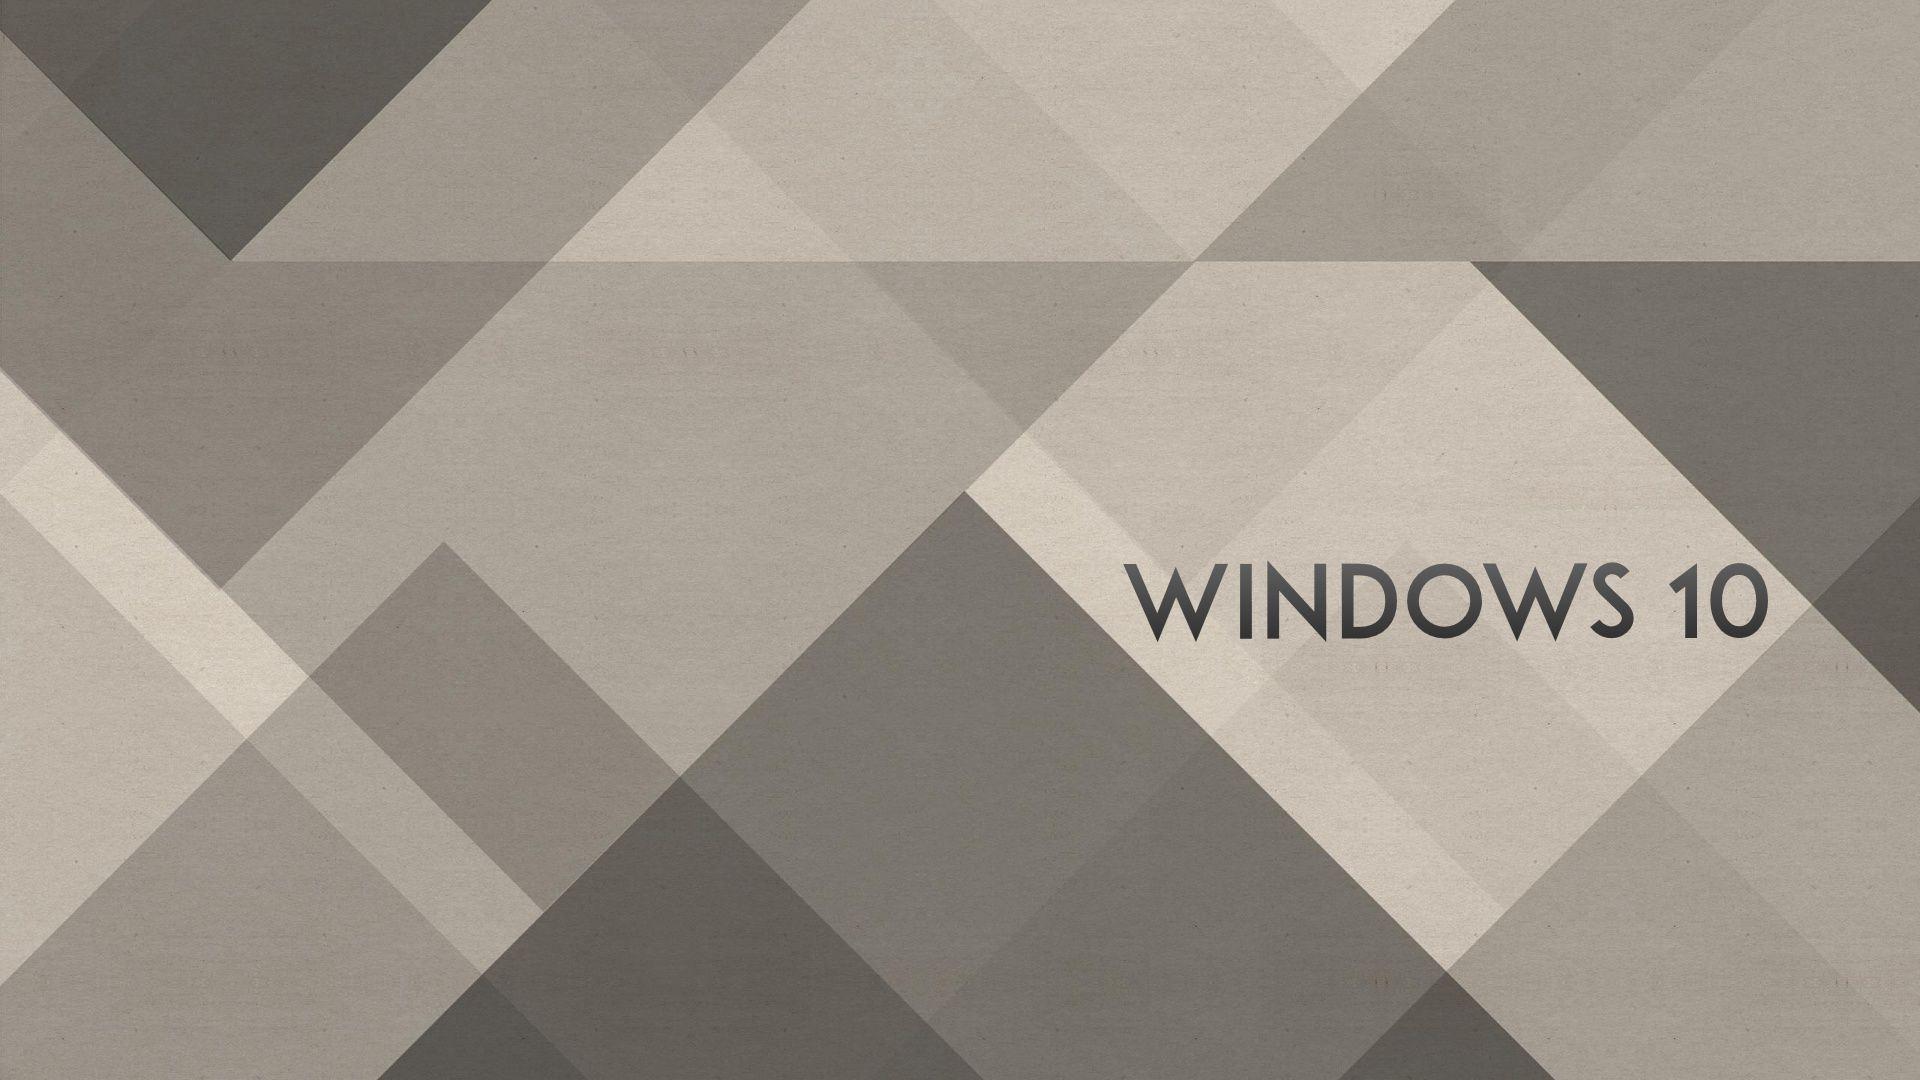 Windows 10 Wallpaper 1080p Full HD Grey Abstract